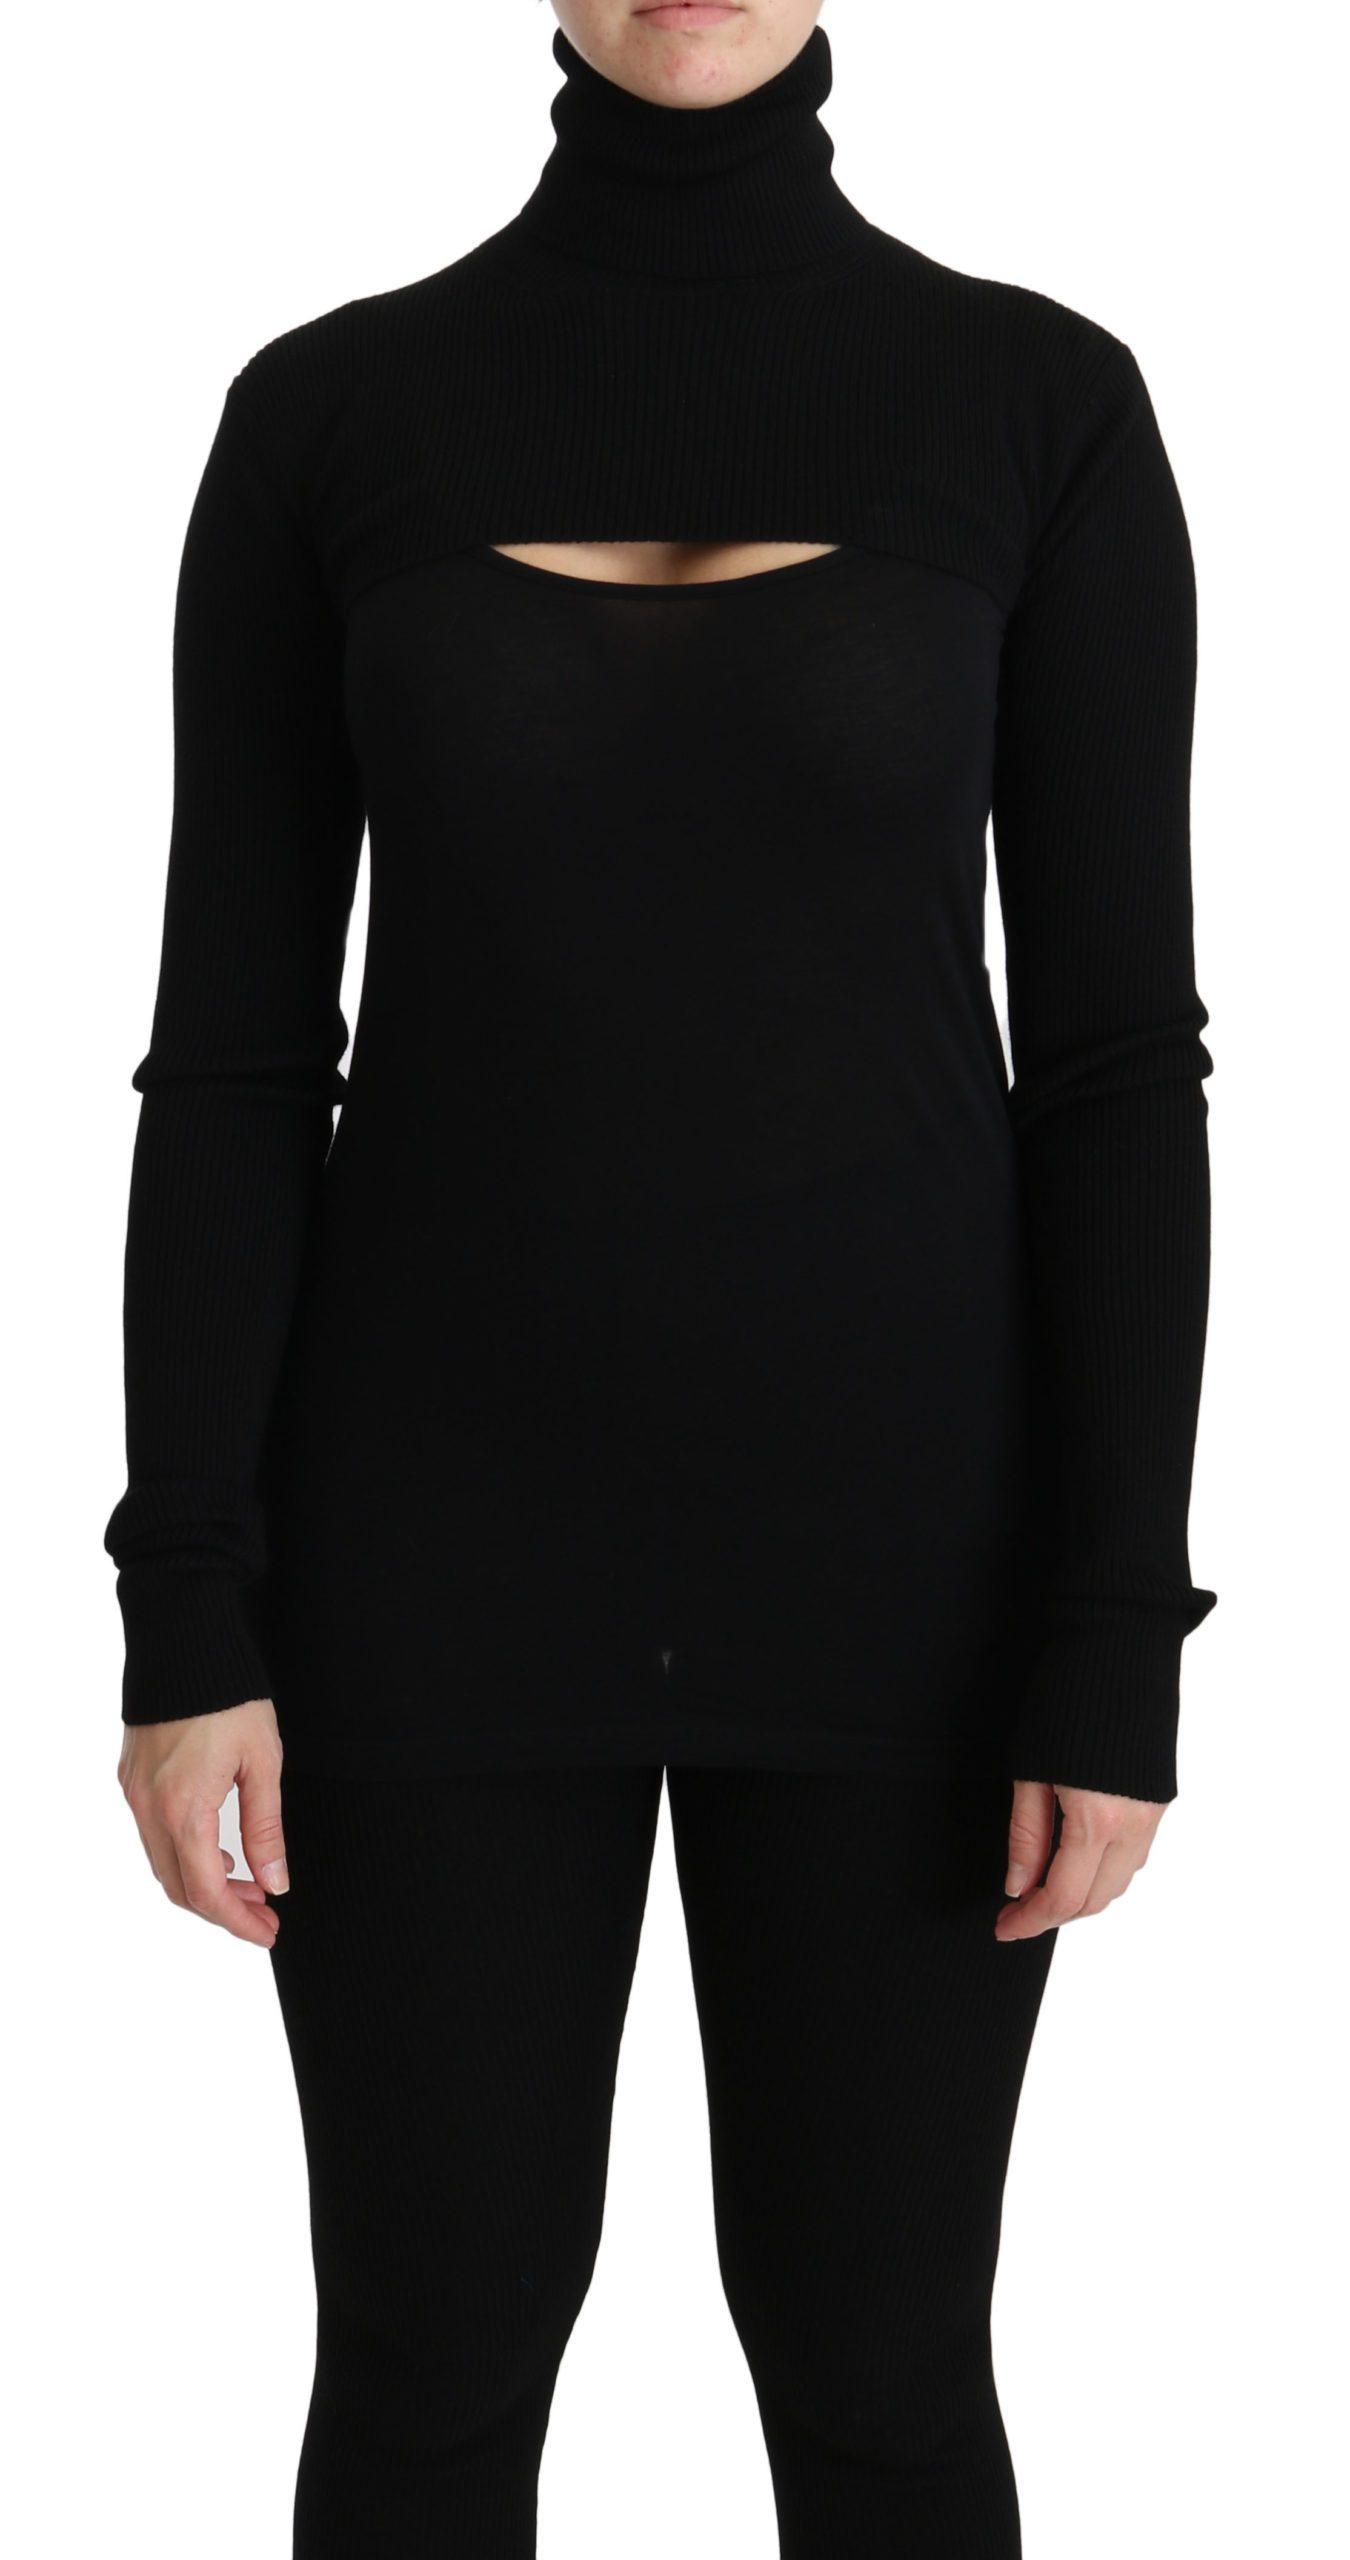 Black Turtleneck Crop Top Wool Sweater - IT40|S